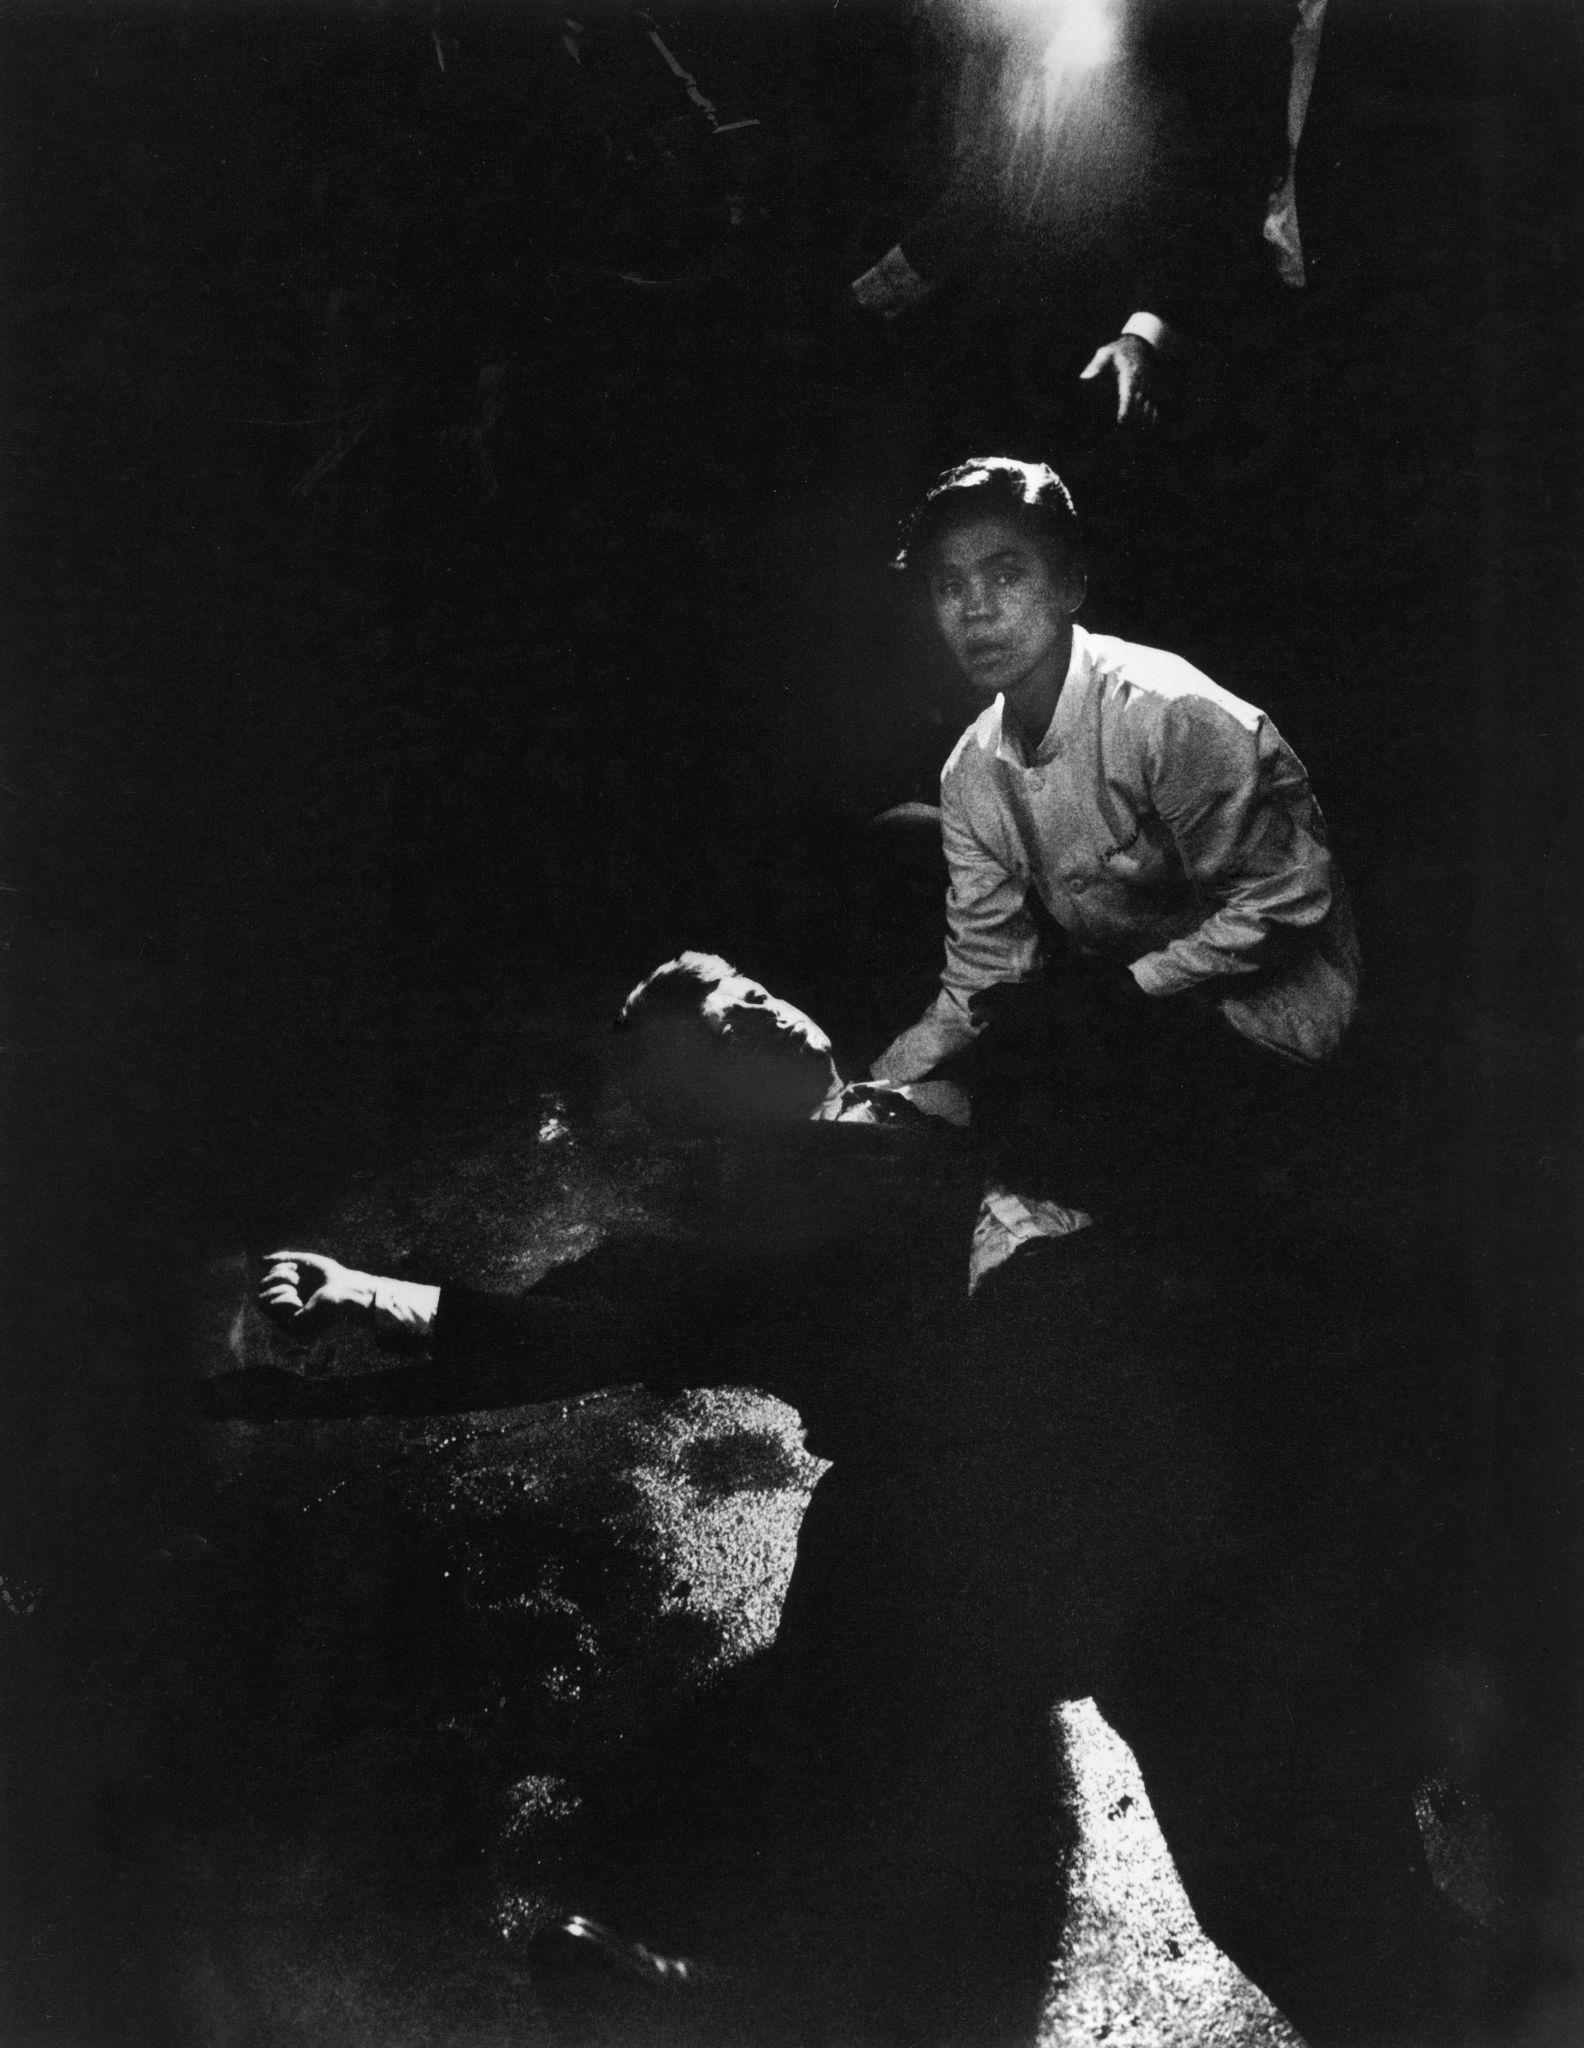 Sen. Robert Kennedy sprawled semiconscious in his